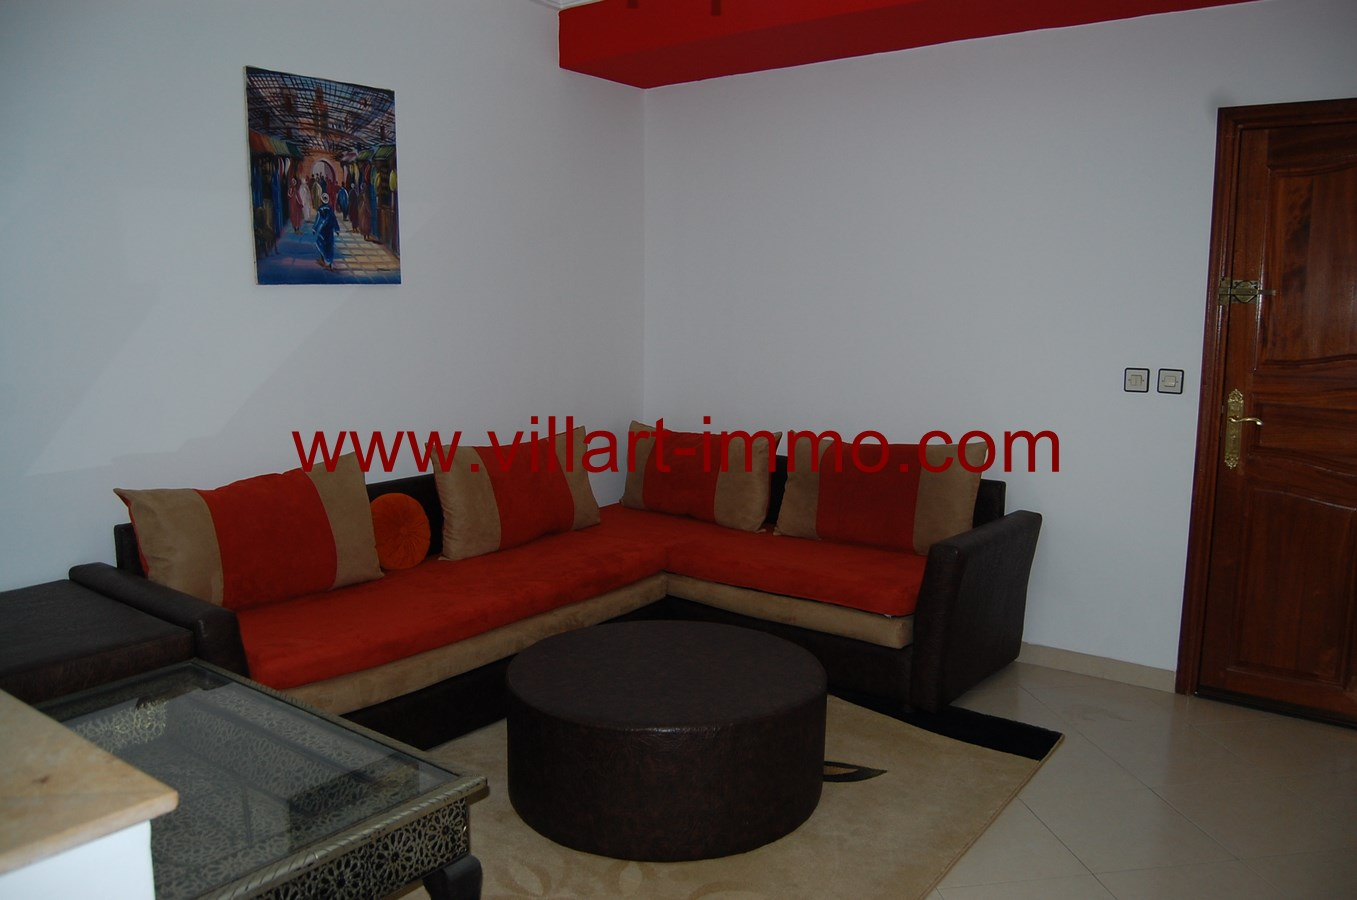 1-a-vendre-appartement-tanger-castilla-salon-1-va426-villart-immo-agence-immobiliere